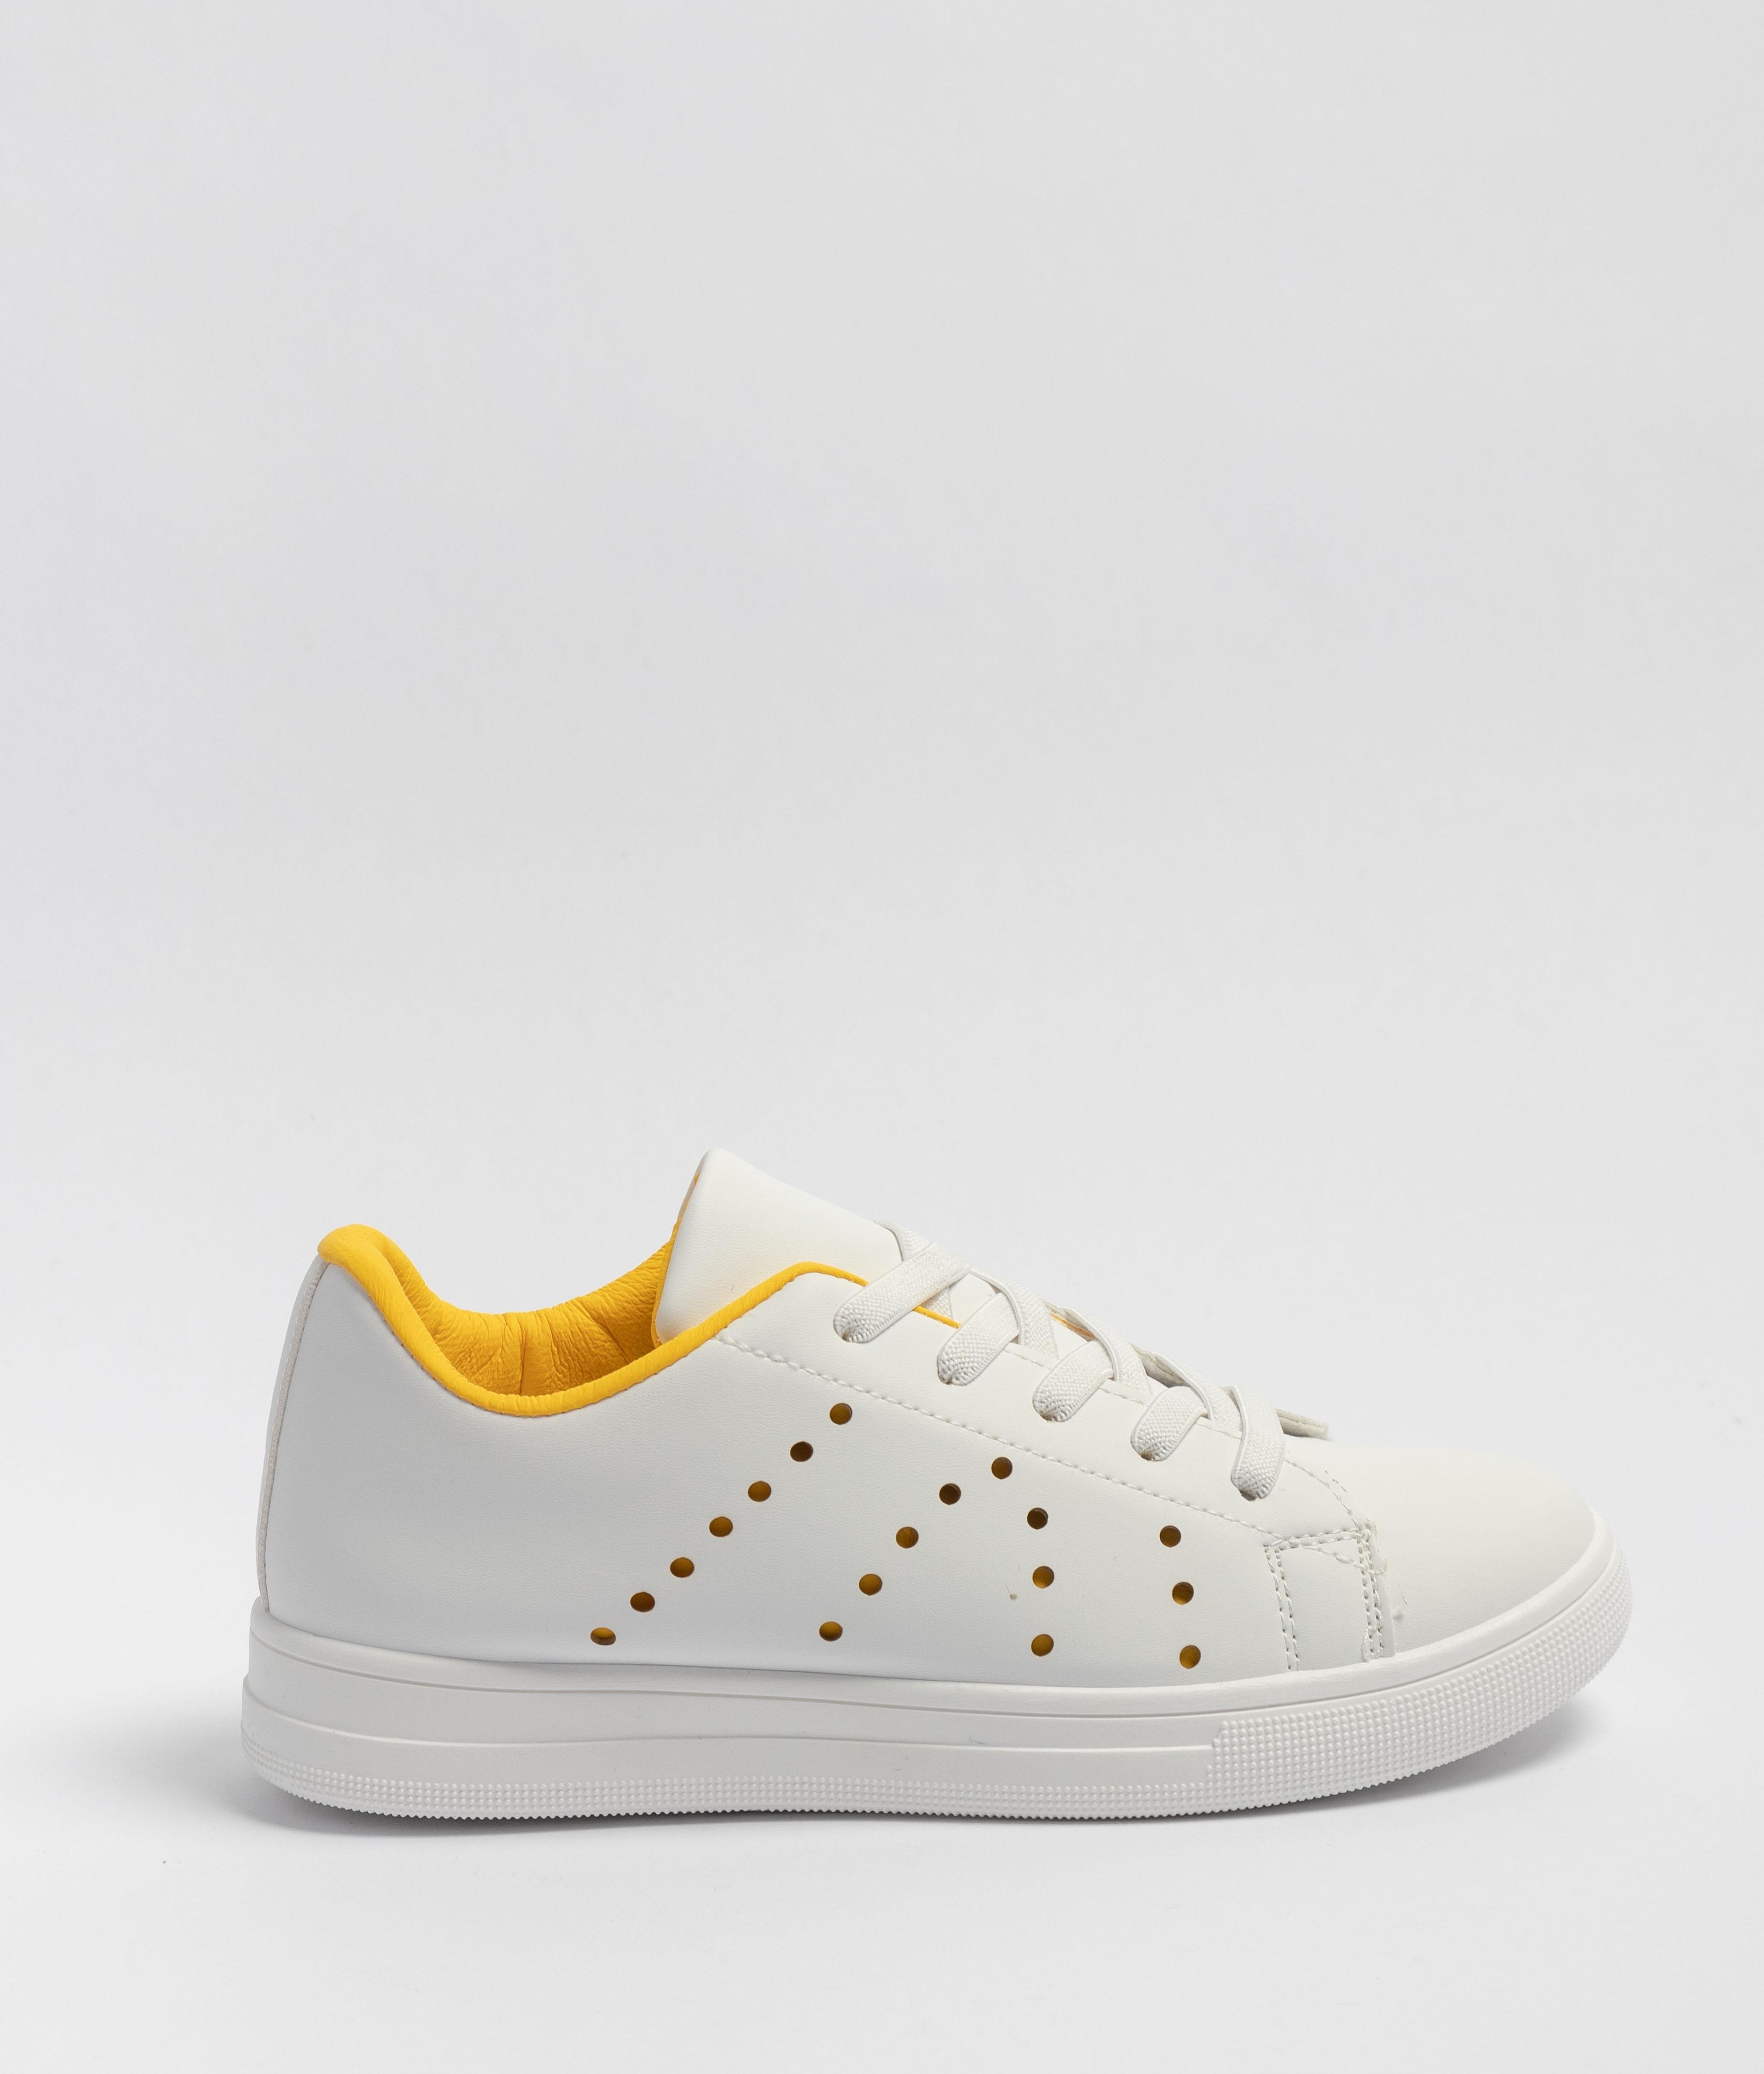 Sneakers Atelier - Jaune